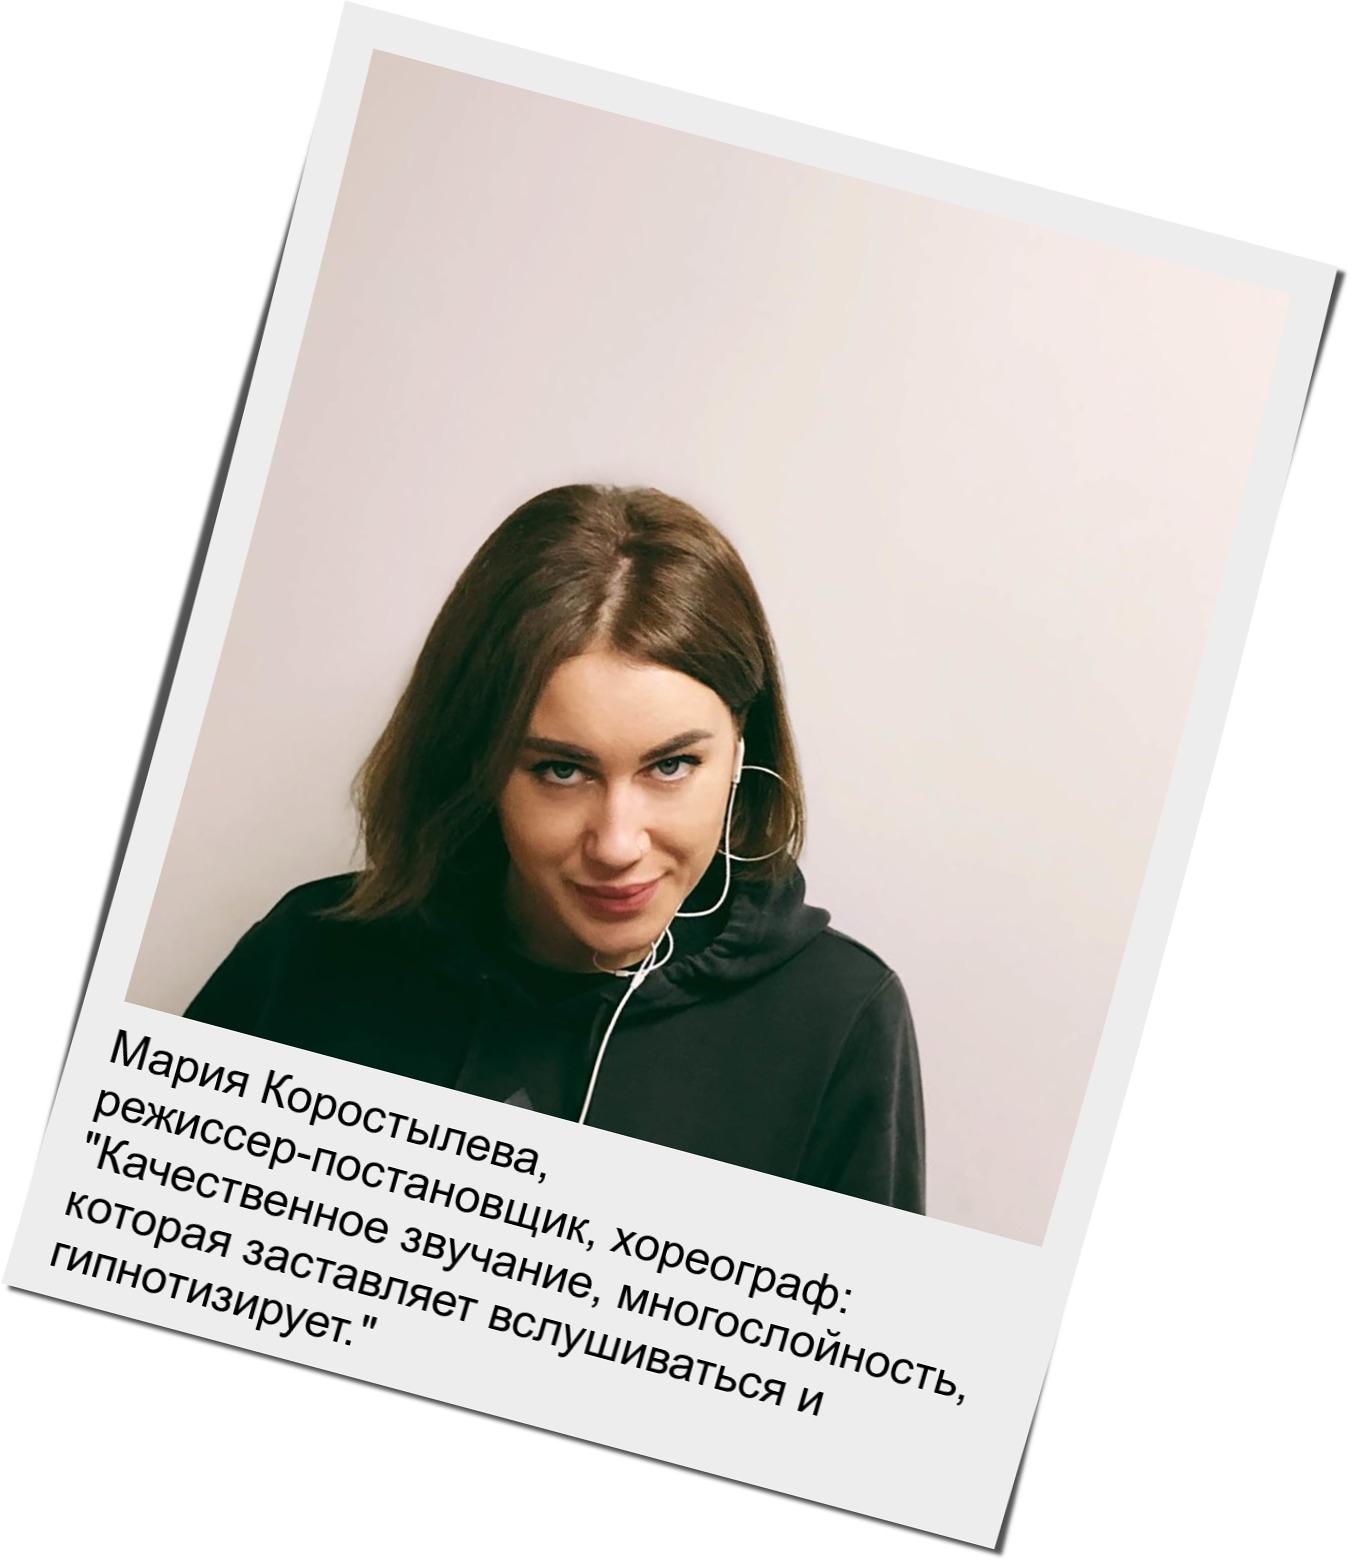 imgonline-com-ua-polaroid-photo4Eb7tYA9H8sz